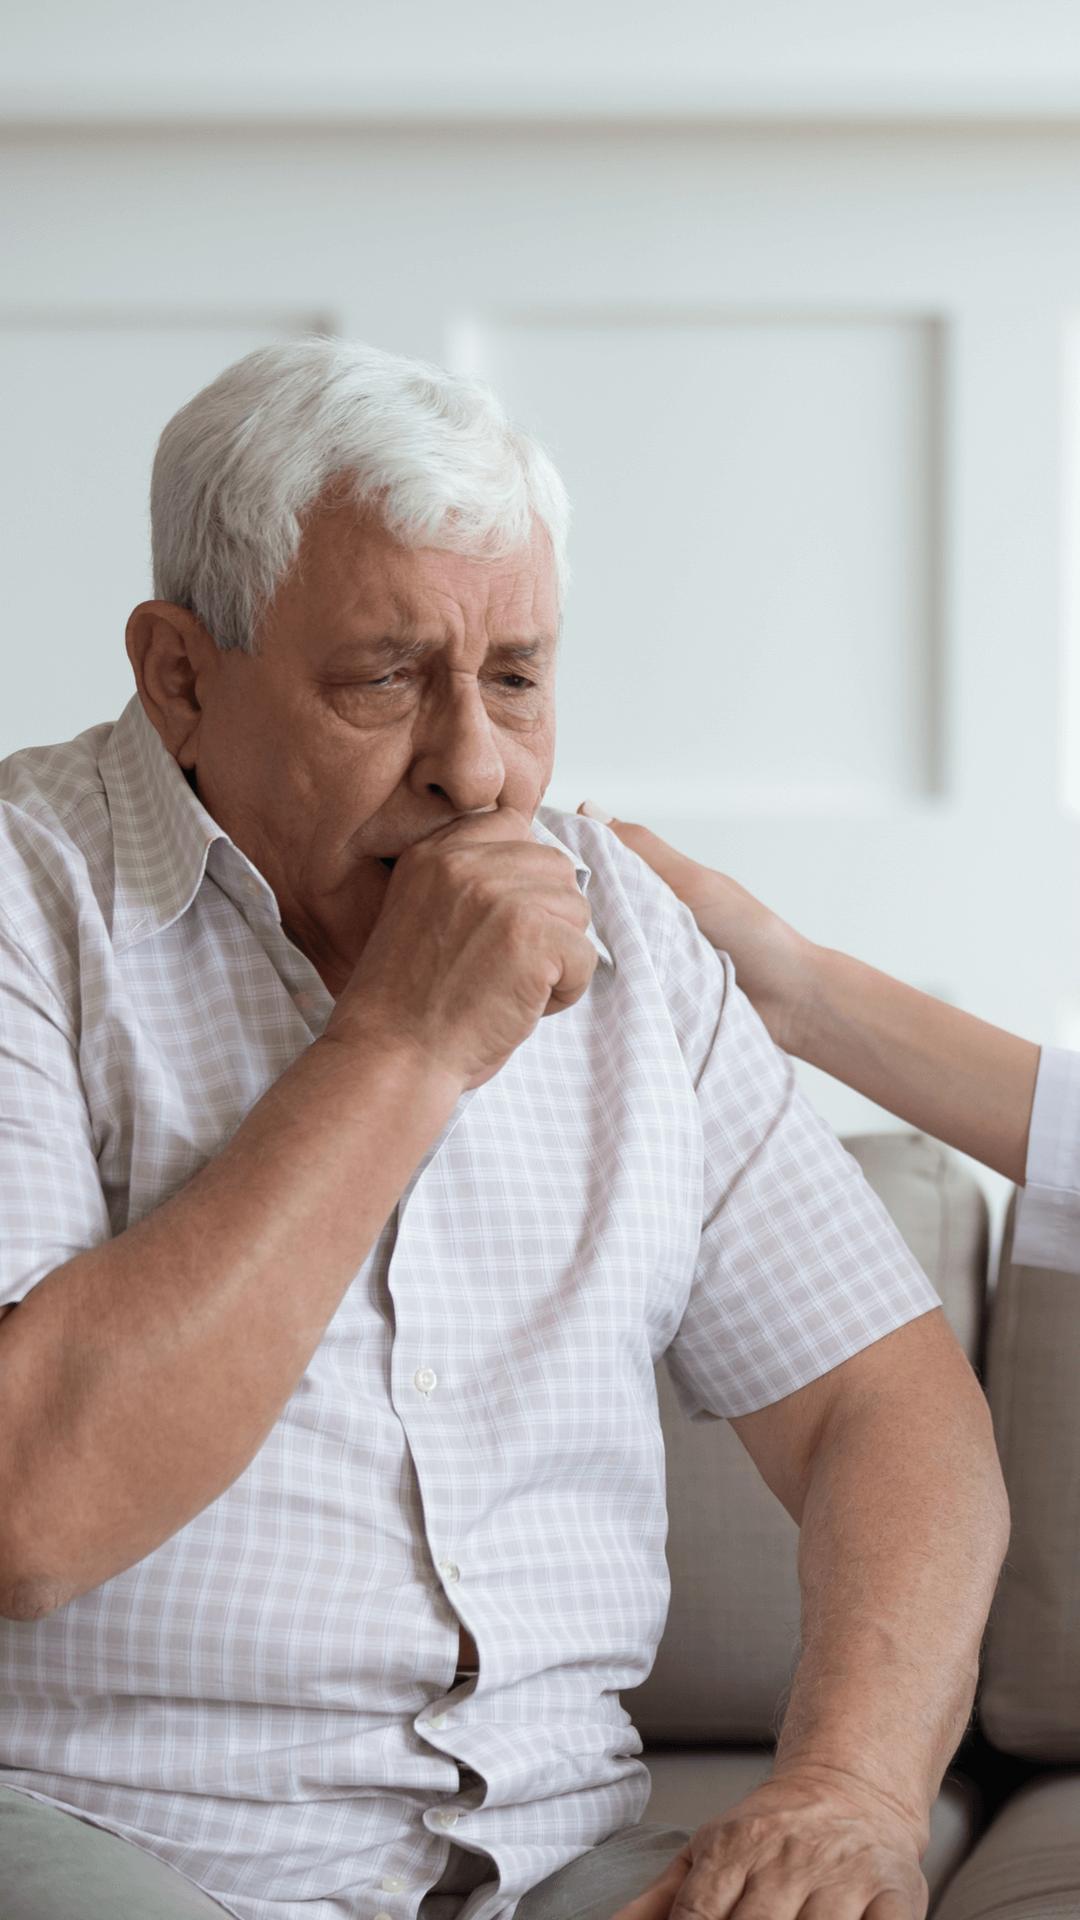 an older man coughing